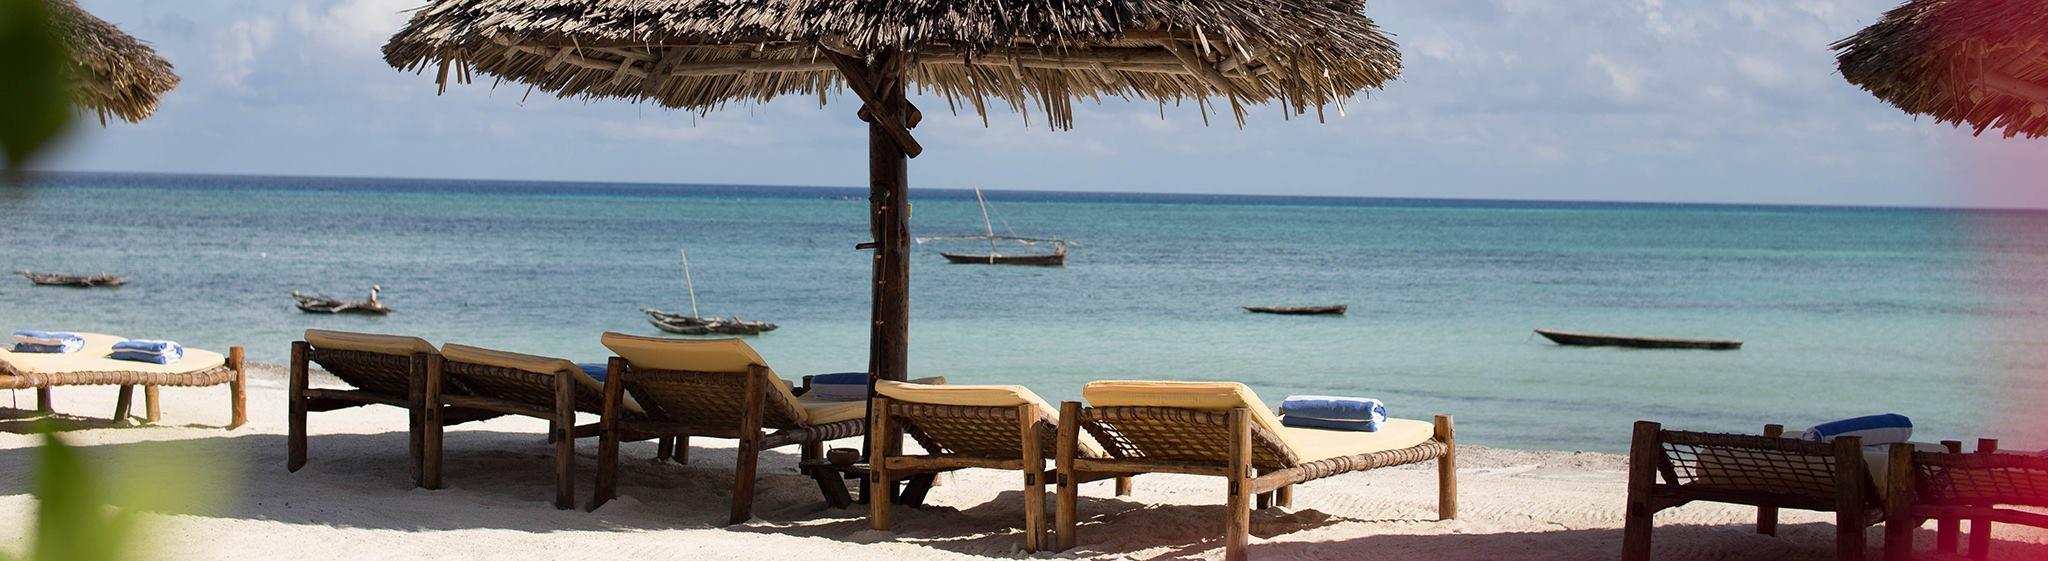 DoubleTree Resort by Hilton Hotel Zanzibar - Nungwi - Safanta Tours & Travel Company Limited